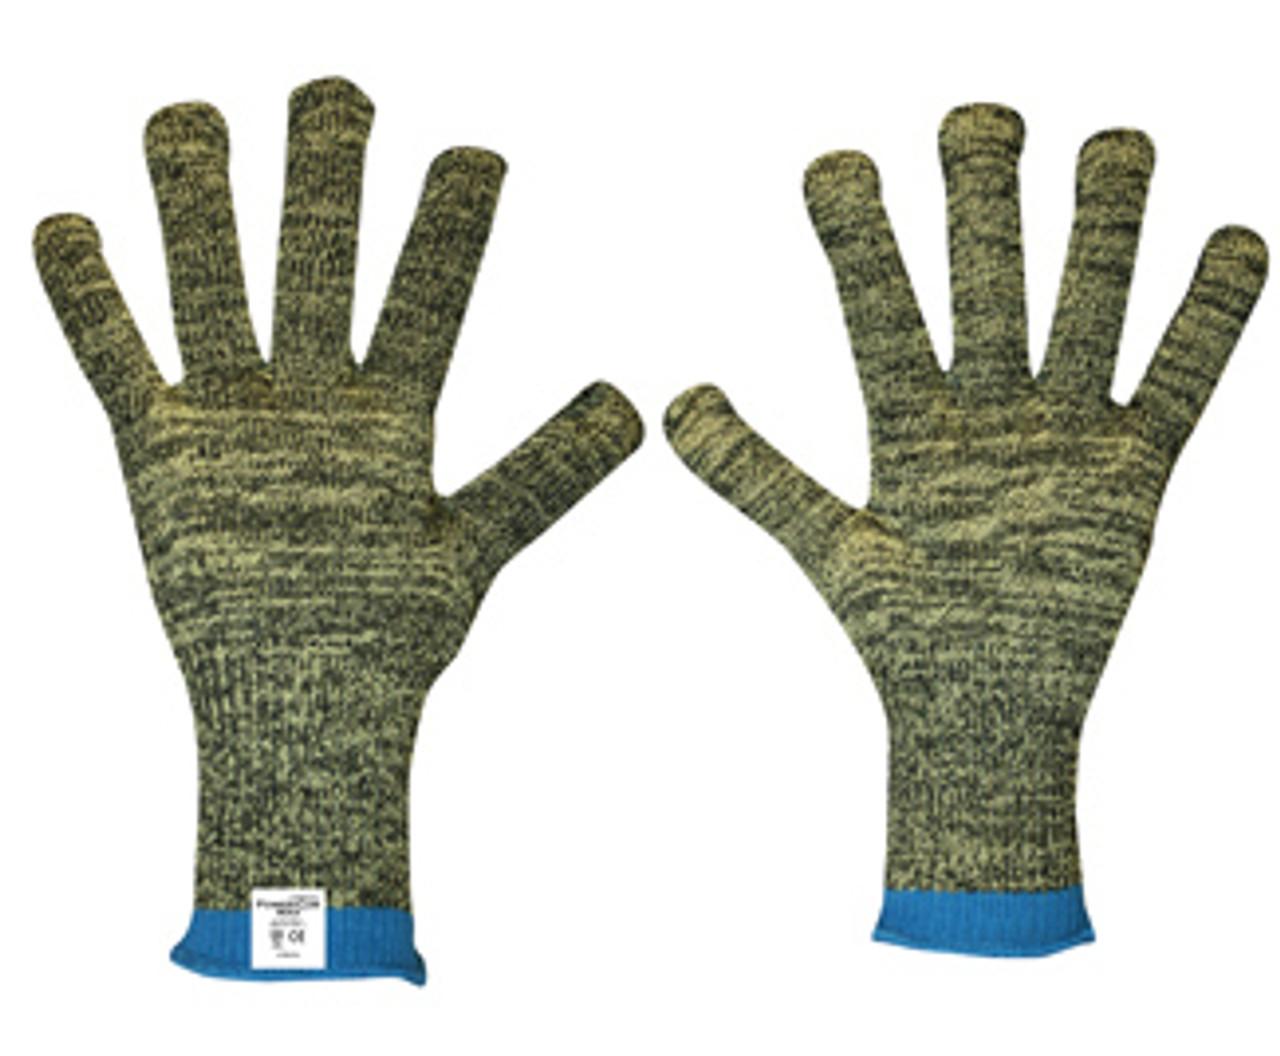 3735: Power-Cor Max Gloves